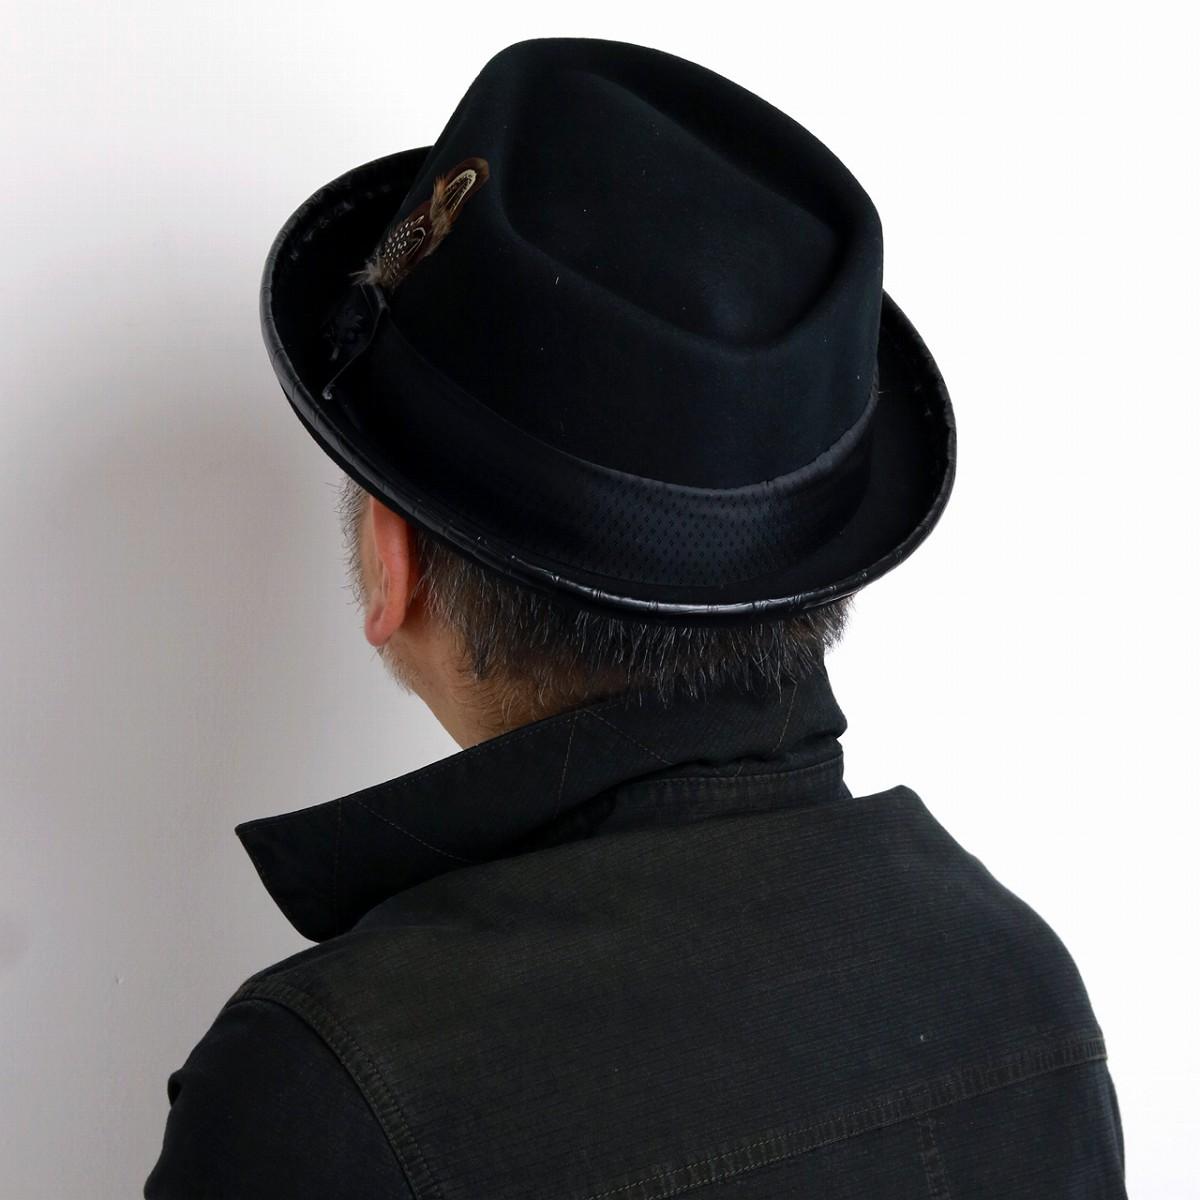 da050824 Trilby Hats For Men Black - Latest and Best Hat Models